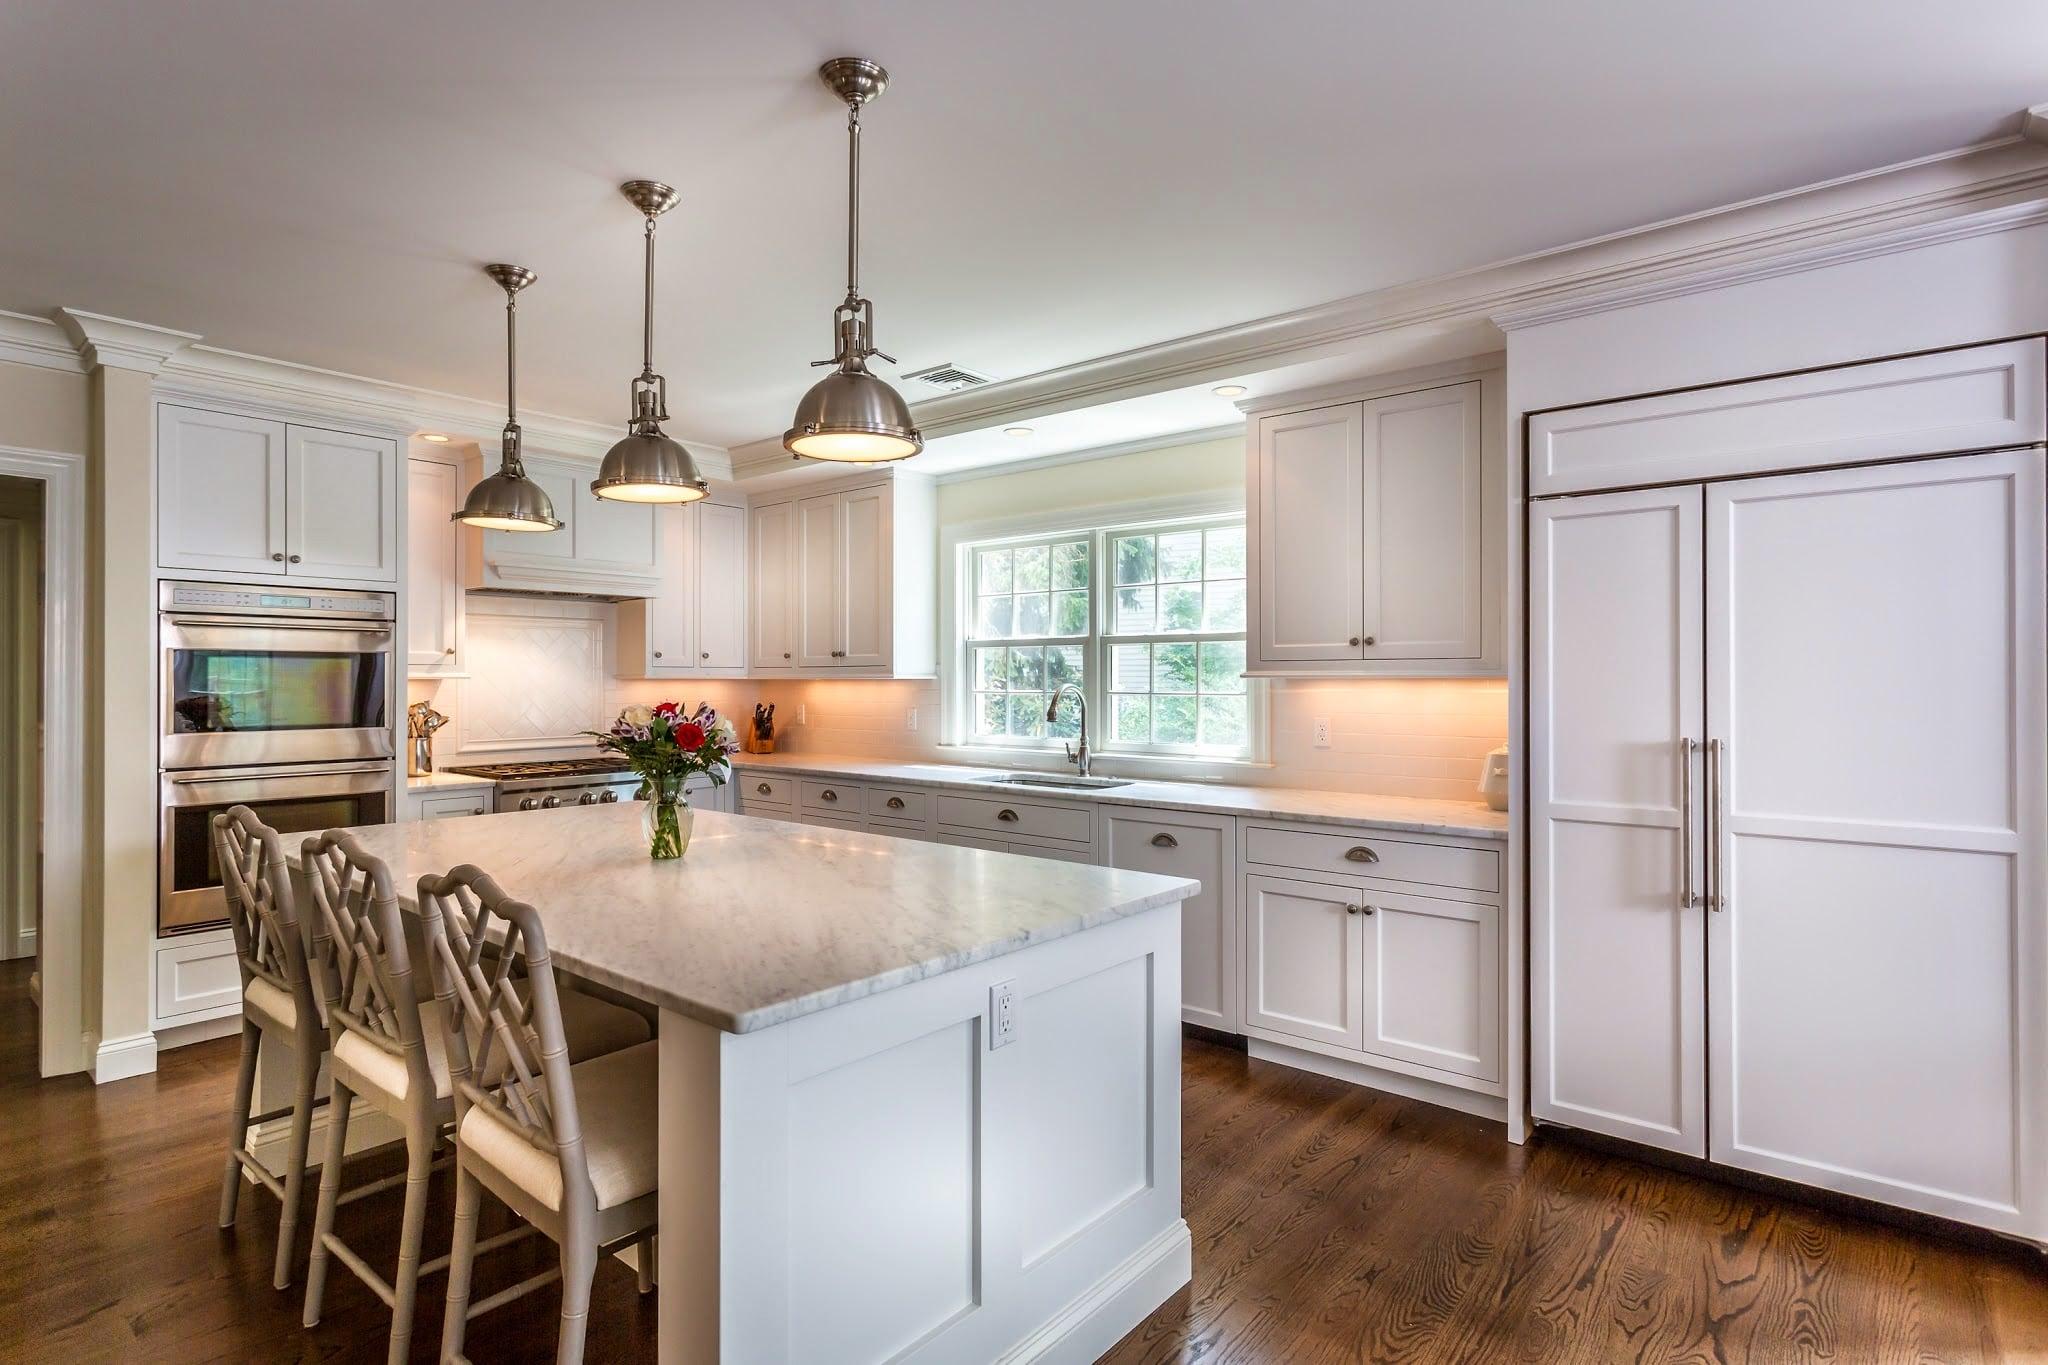 Kitchen Island for Darien CT Renovations